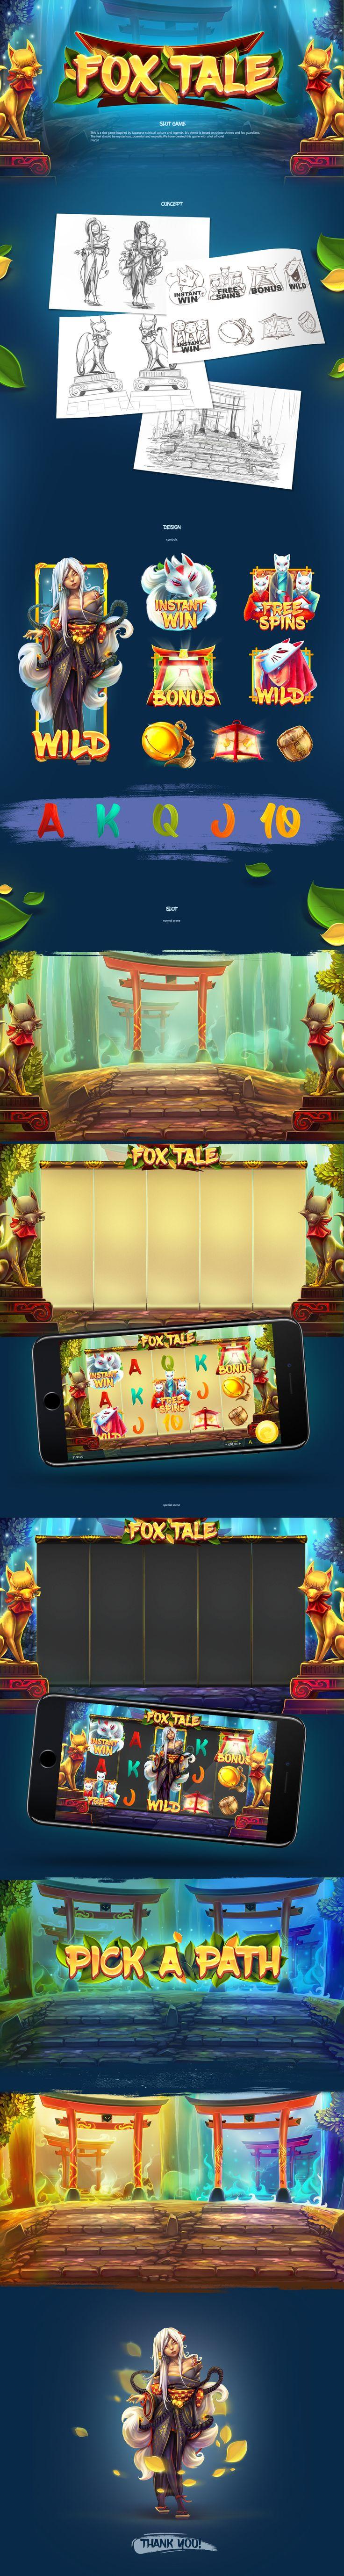 Fox Tale - Slot Game on Behance